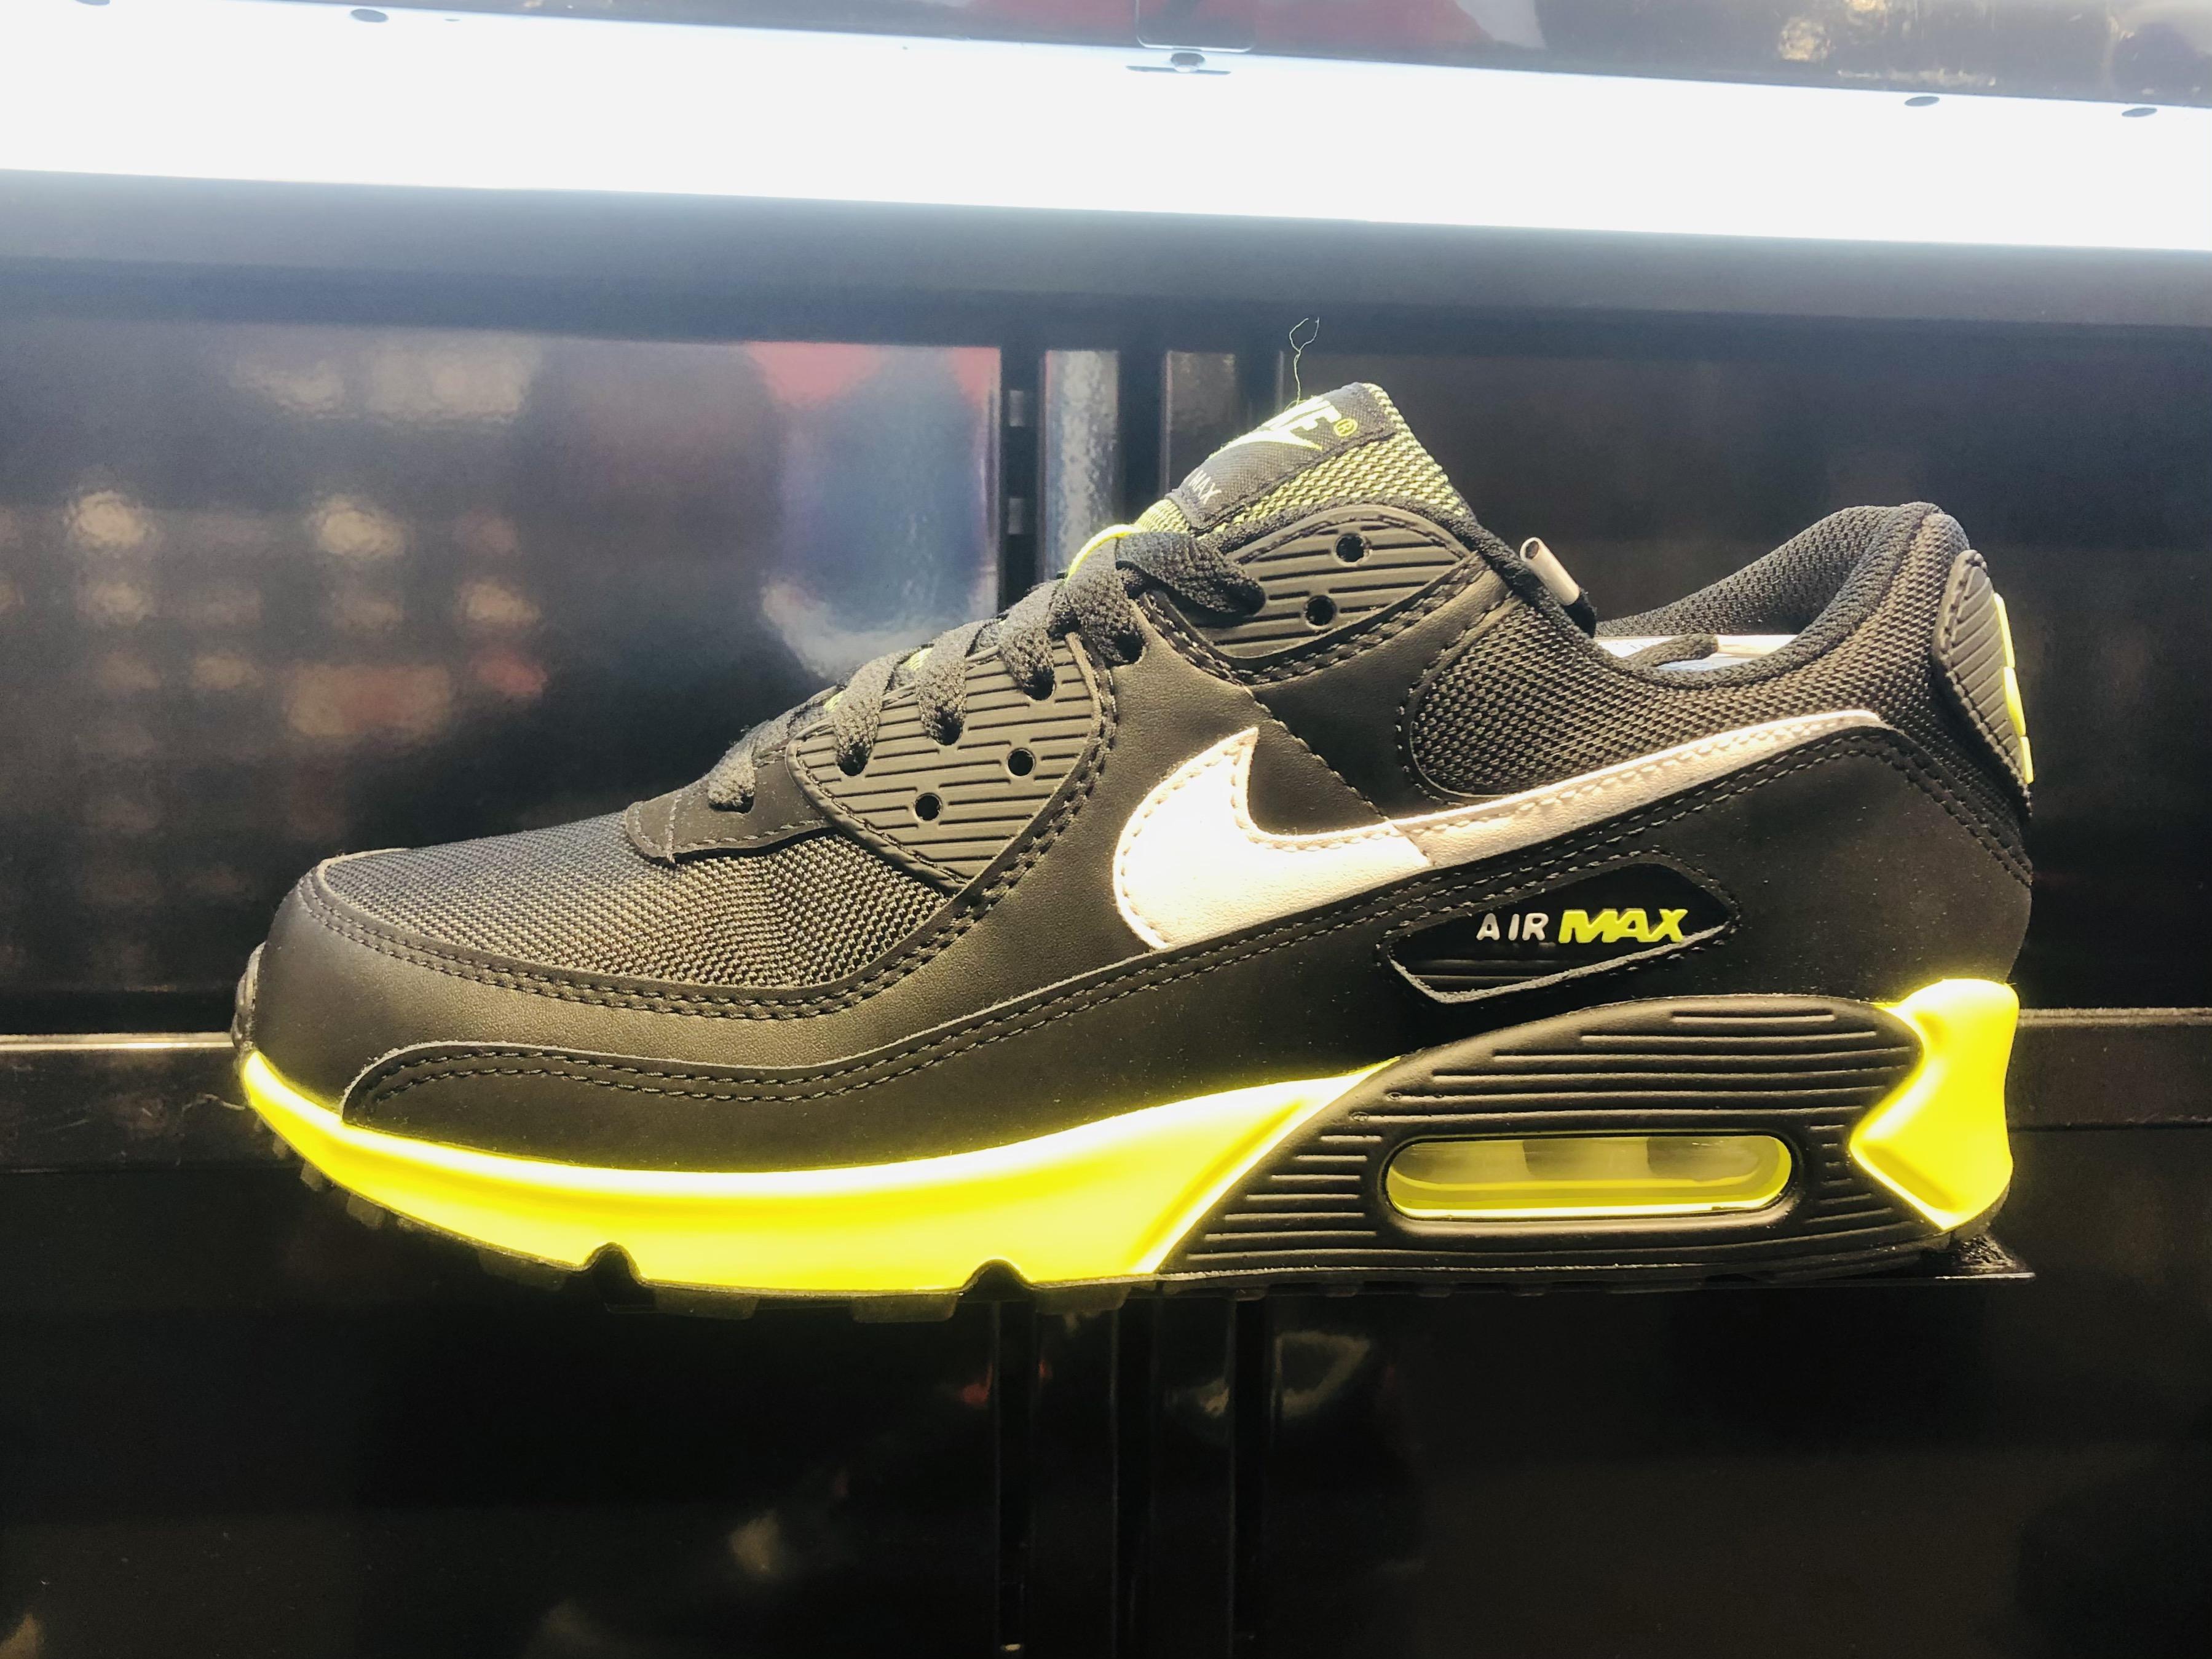 File:Nike Air Max 90 Junior.jpg - Wikimedia Commons